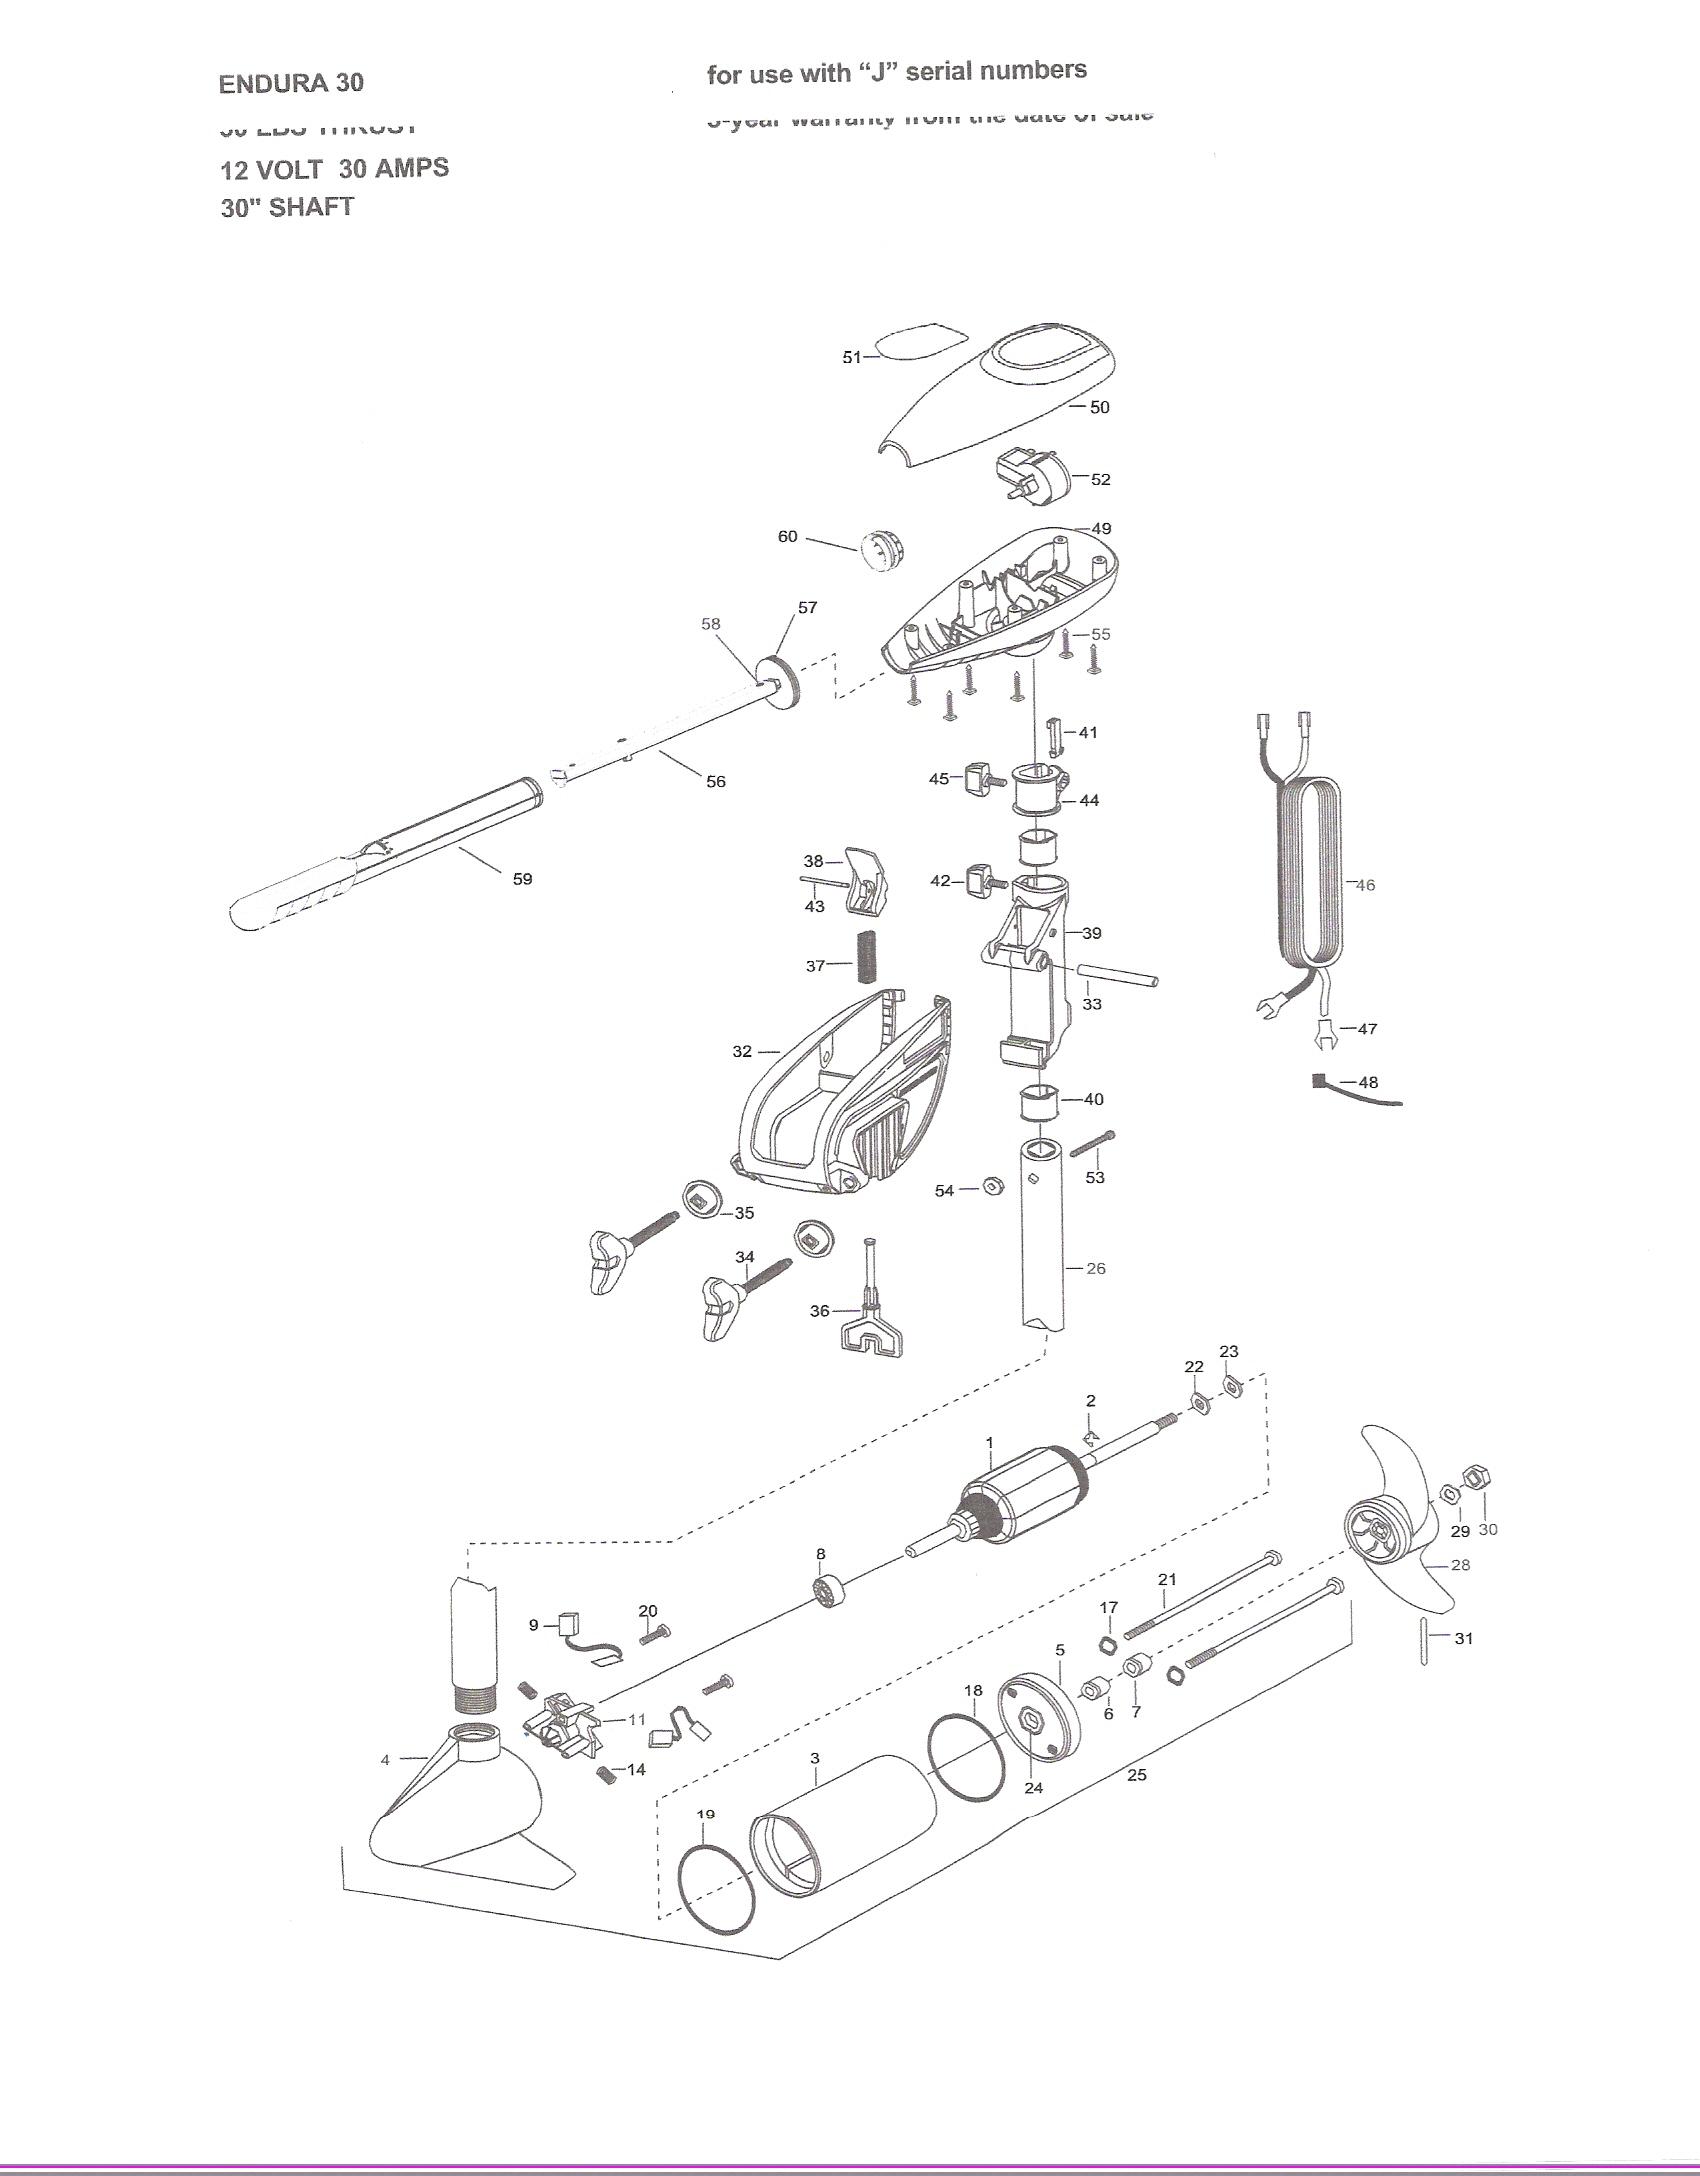 hampton bay ceiling fans 3 sd wiring diagram 117 wiring